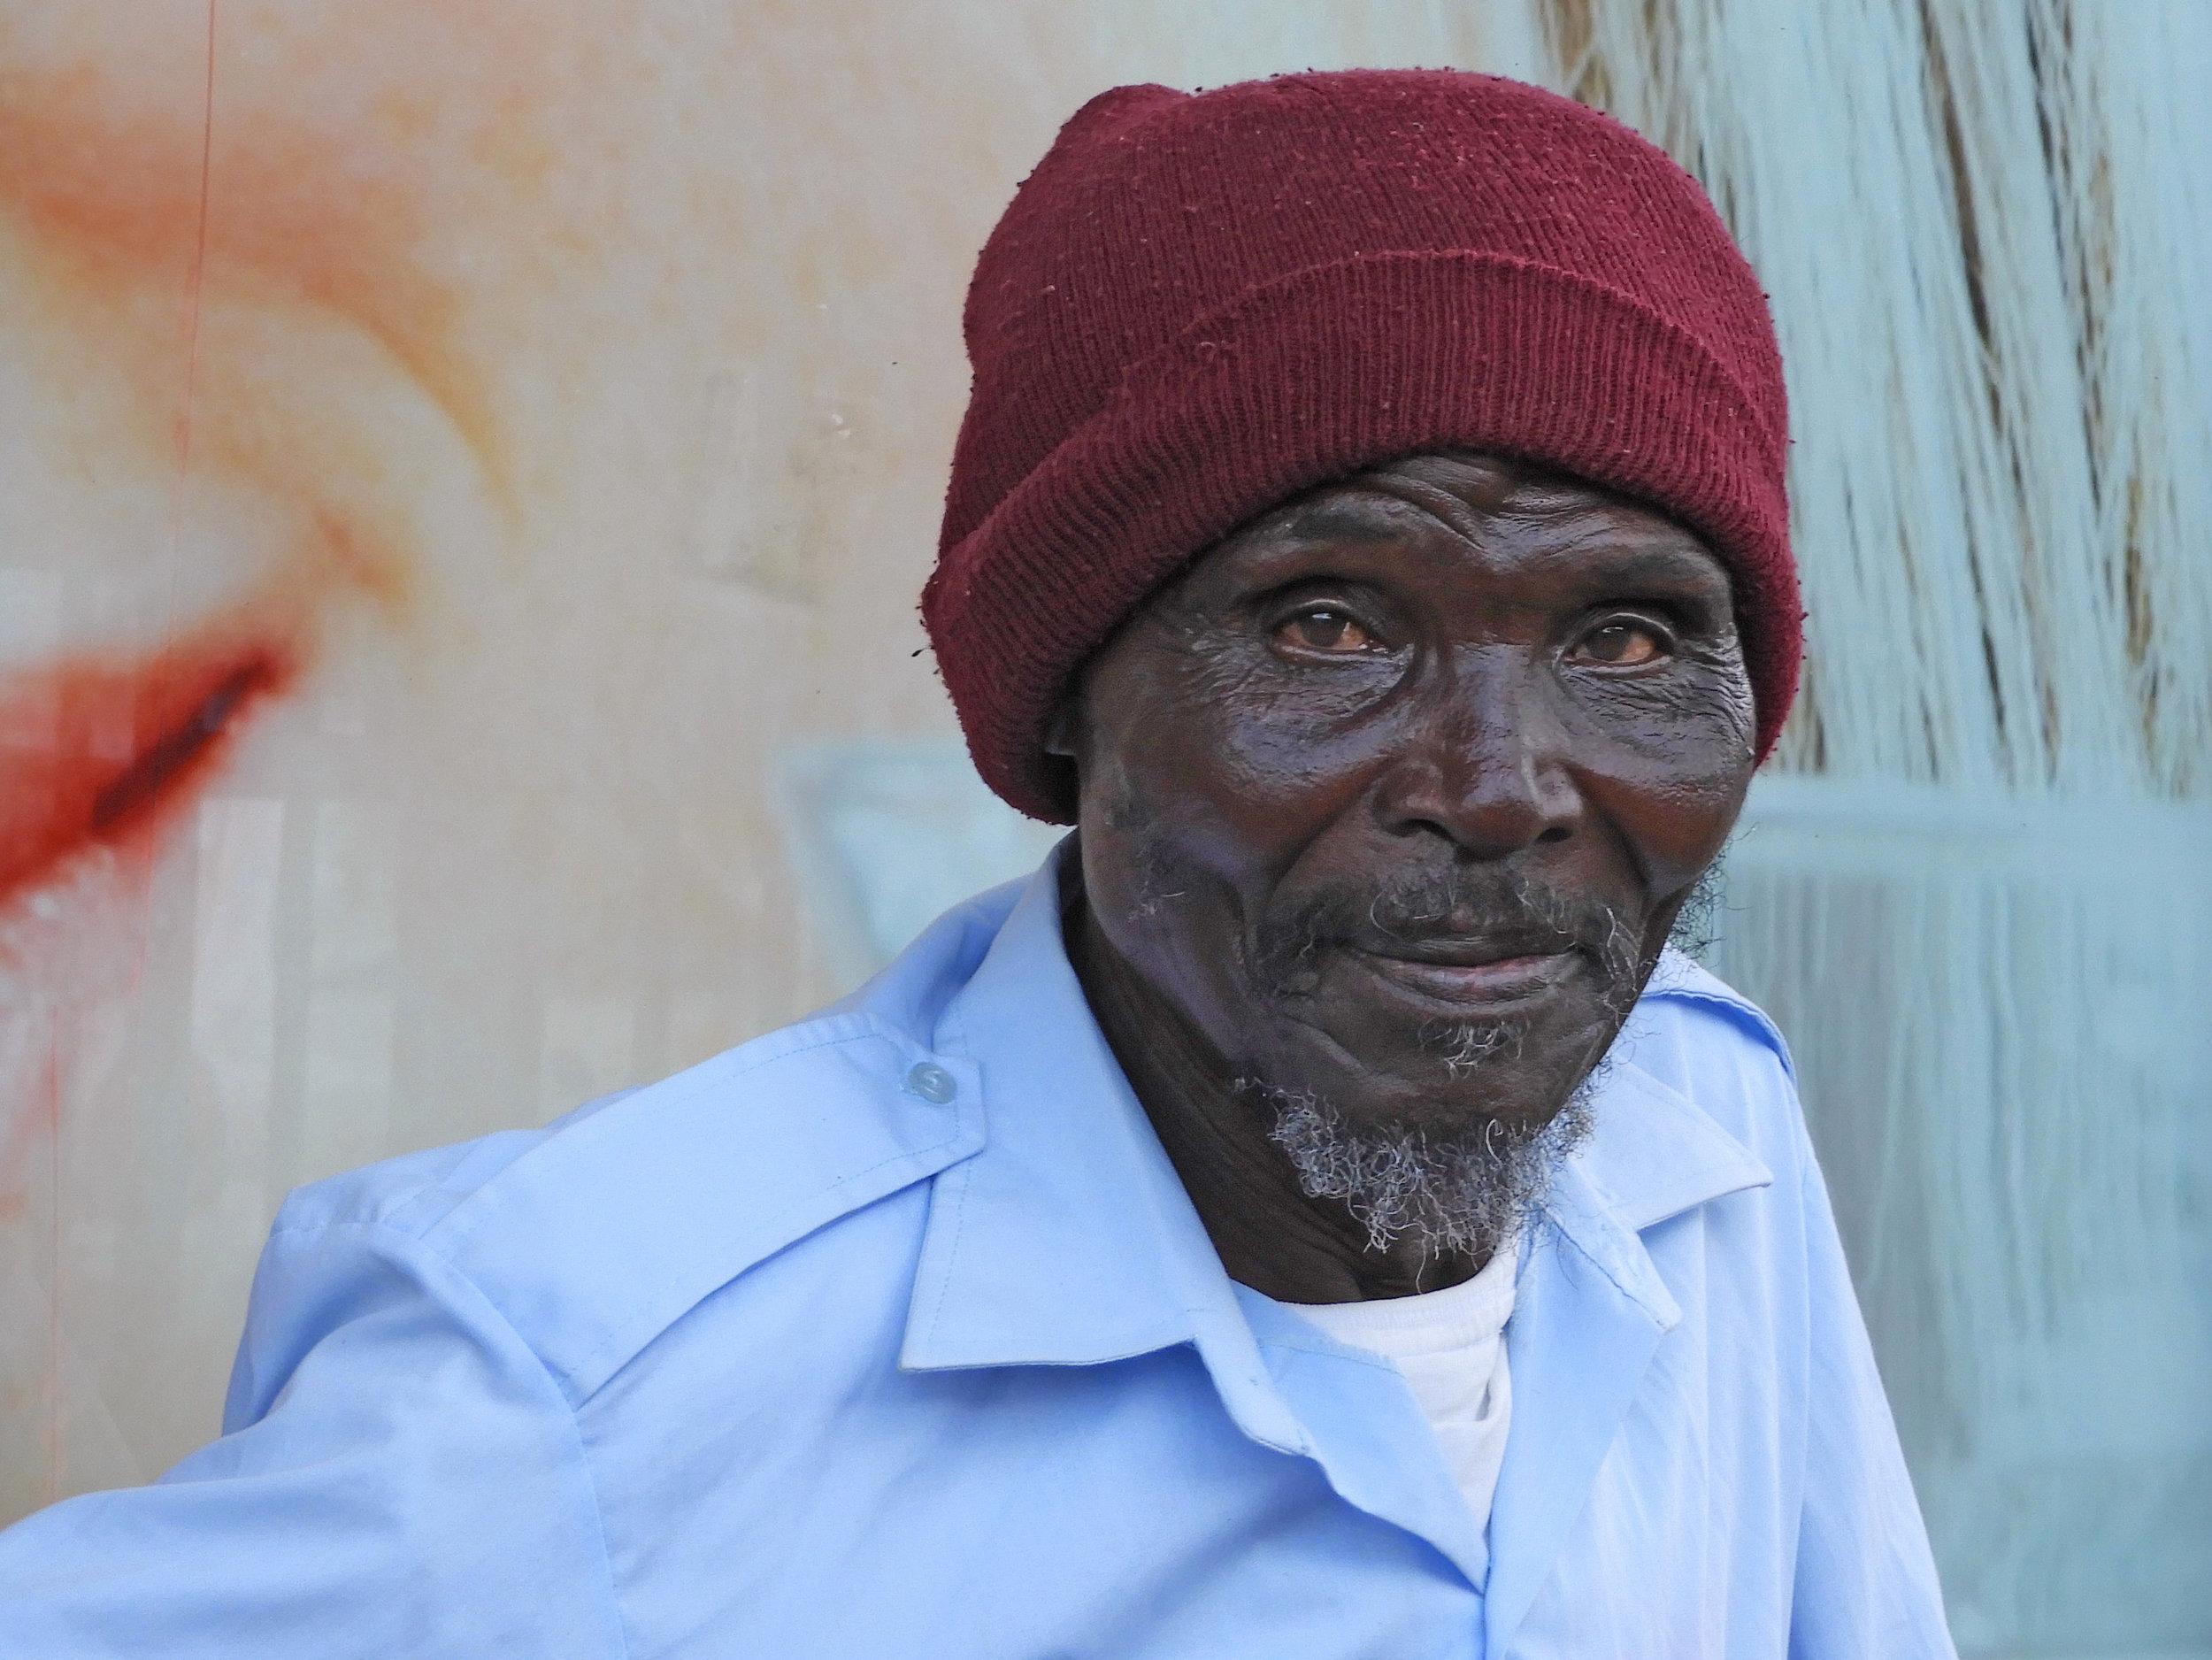 Portret uit Zuid Afrika